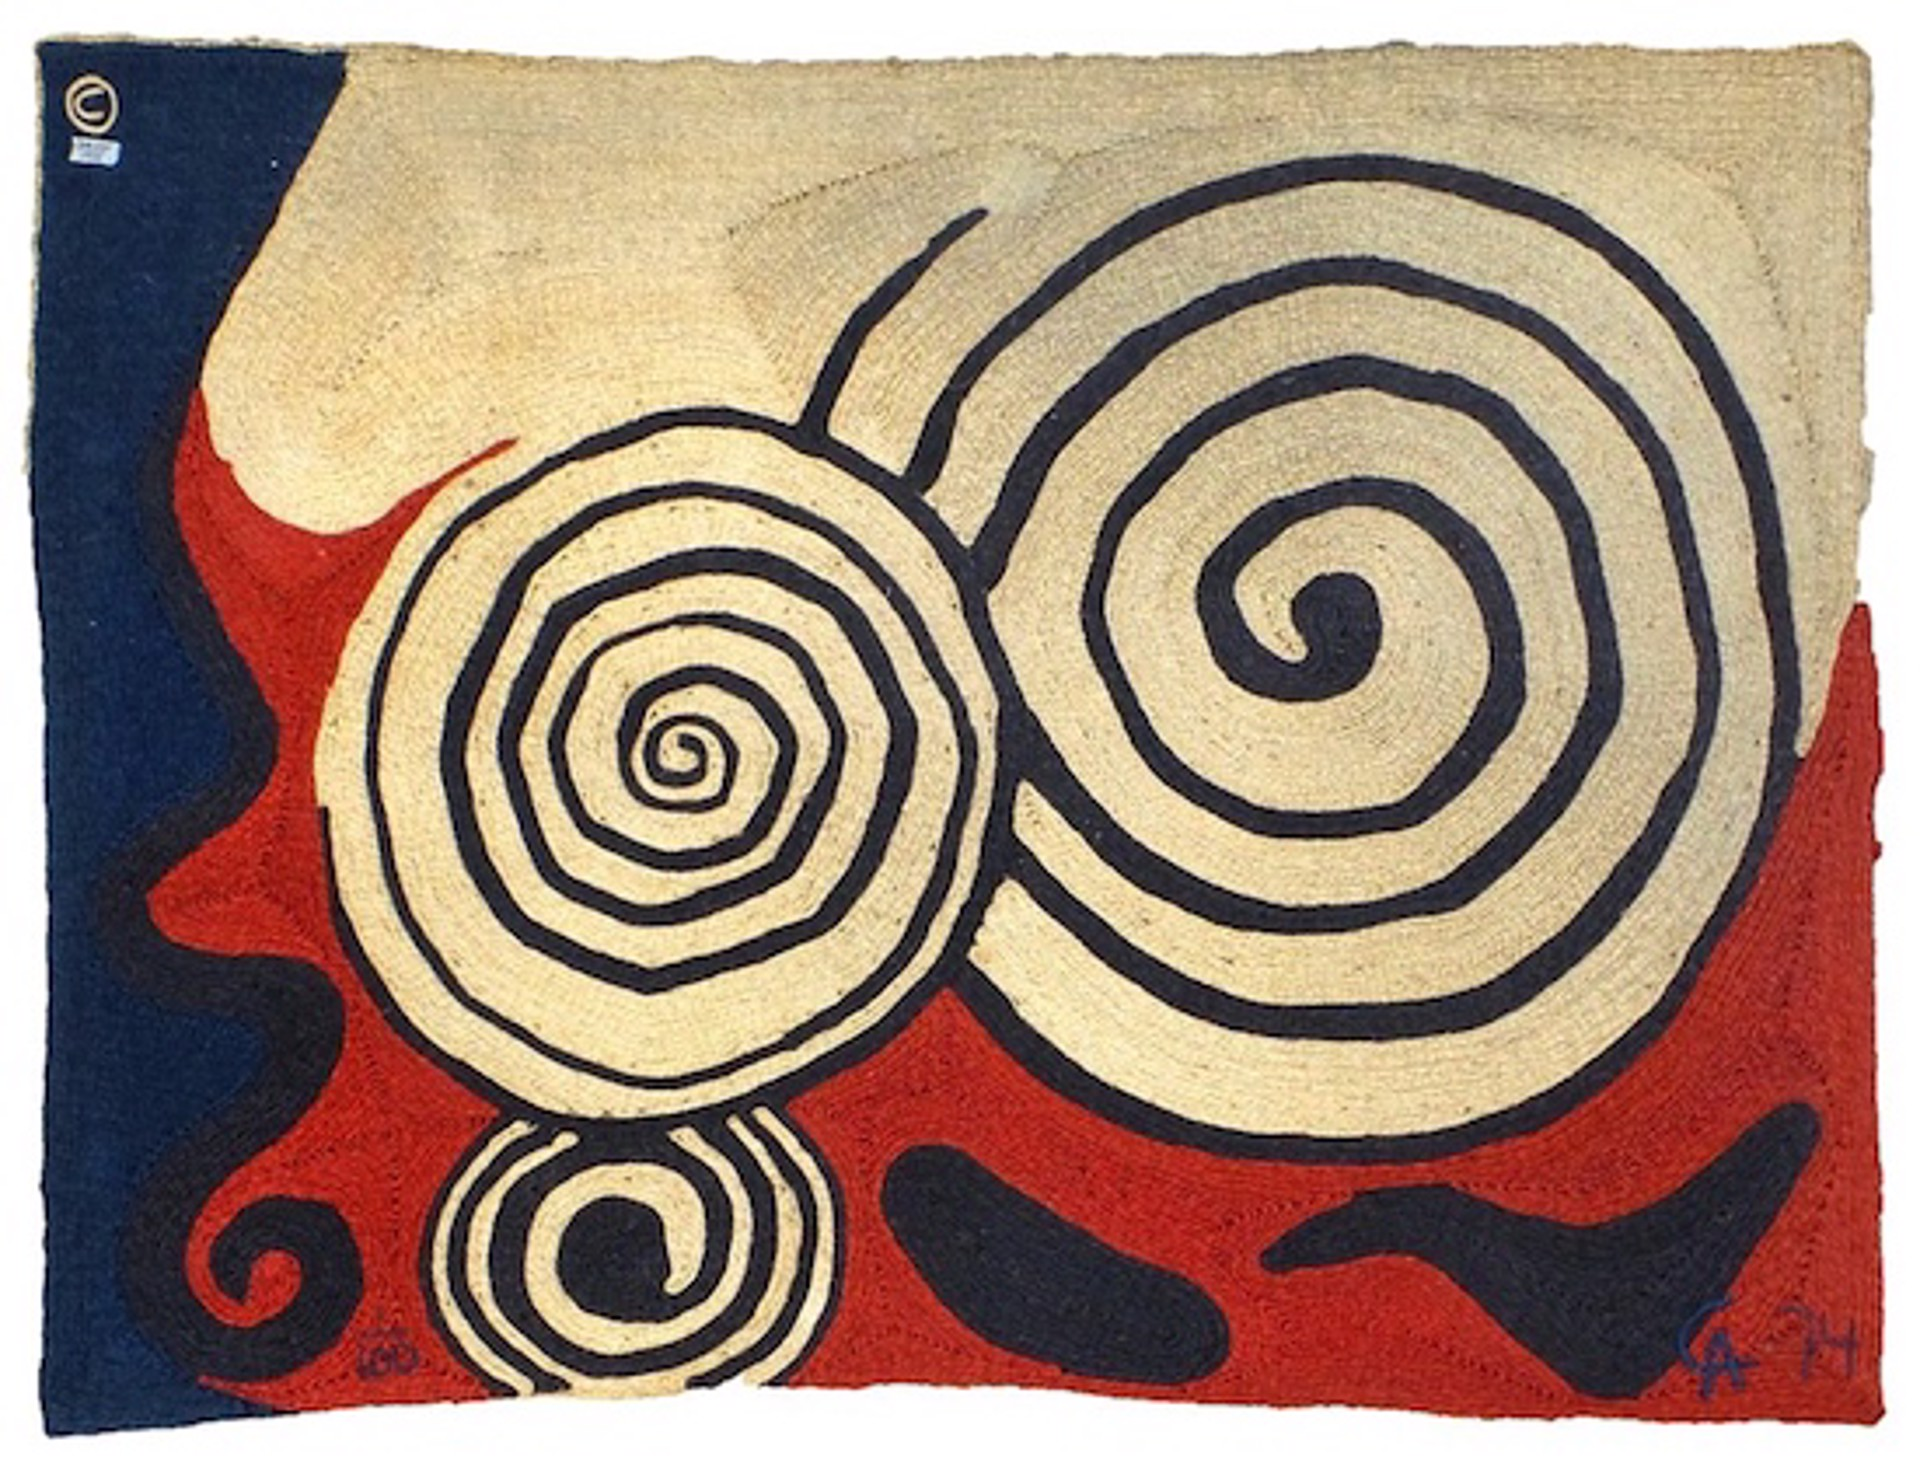 Three Concentric Circles by Alexander Calder